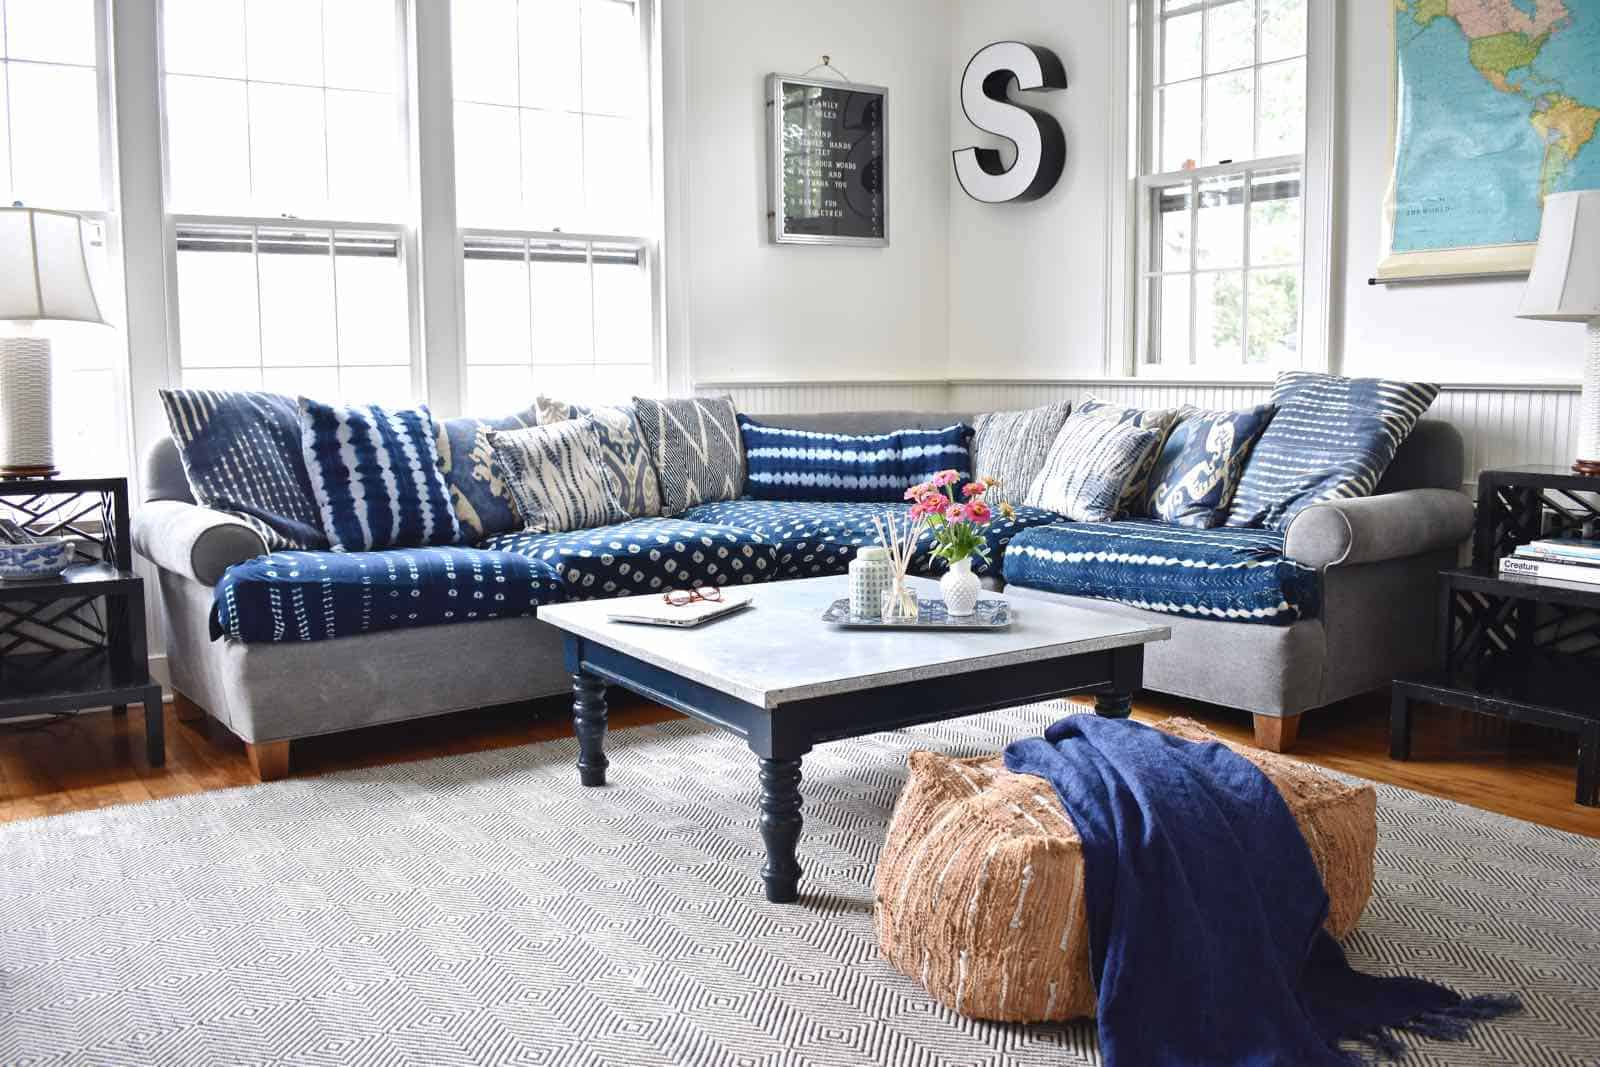 shibori cloth wrapped sofa cushions